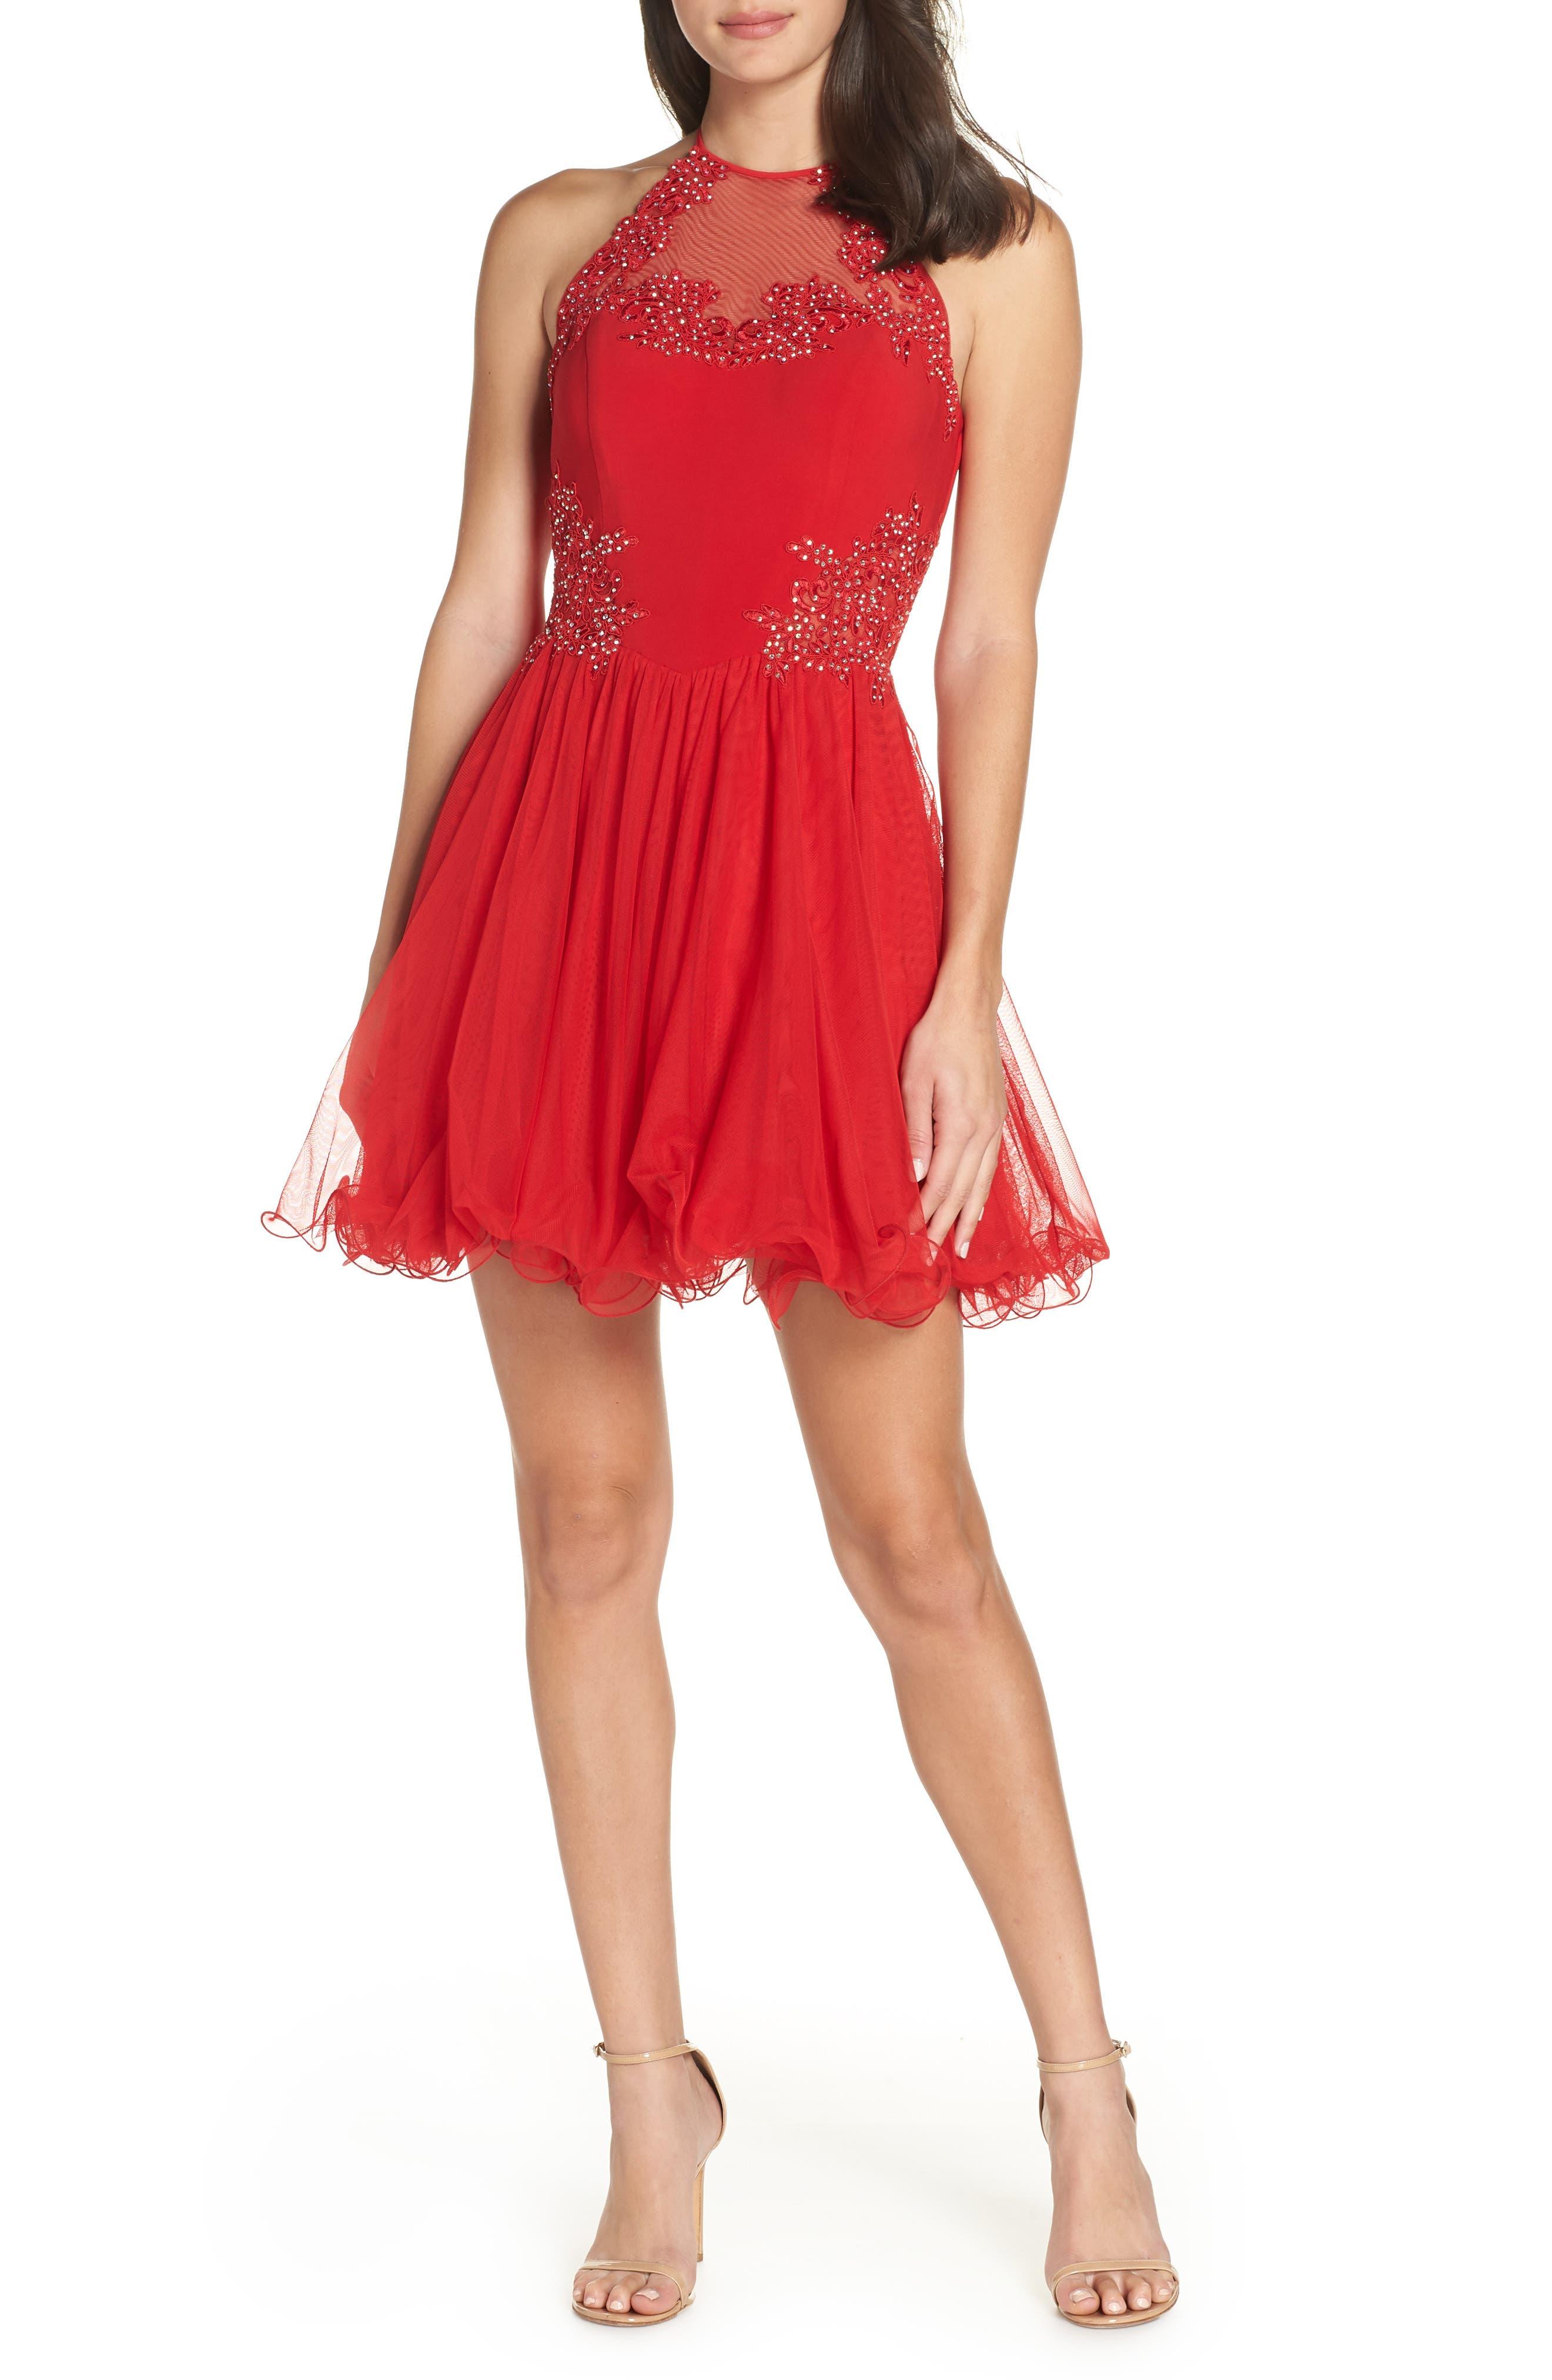 Blondie Nites Applique Mesh Fit & Flare Halter Dress, Red